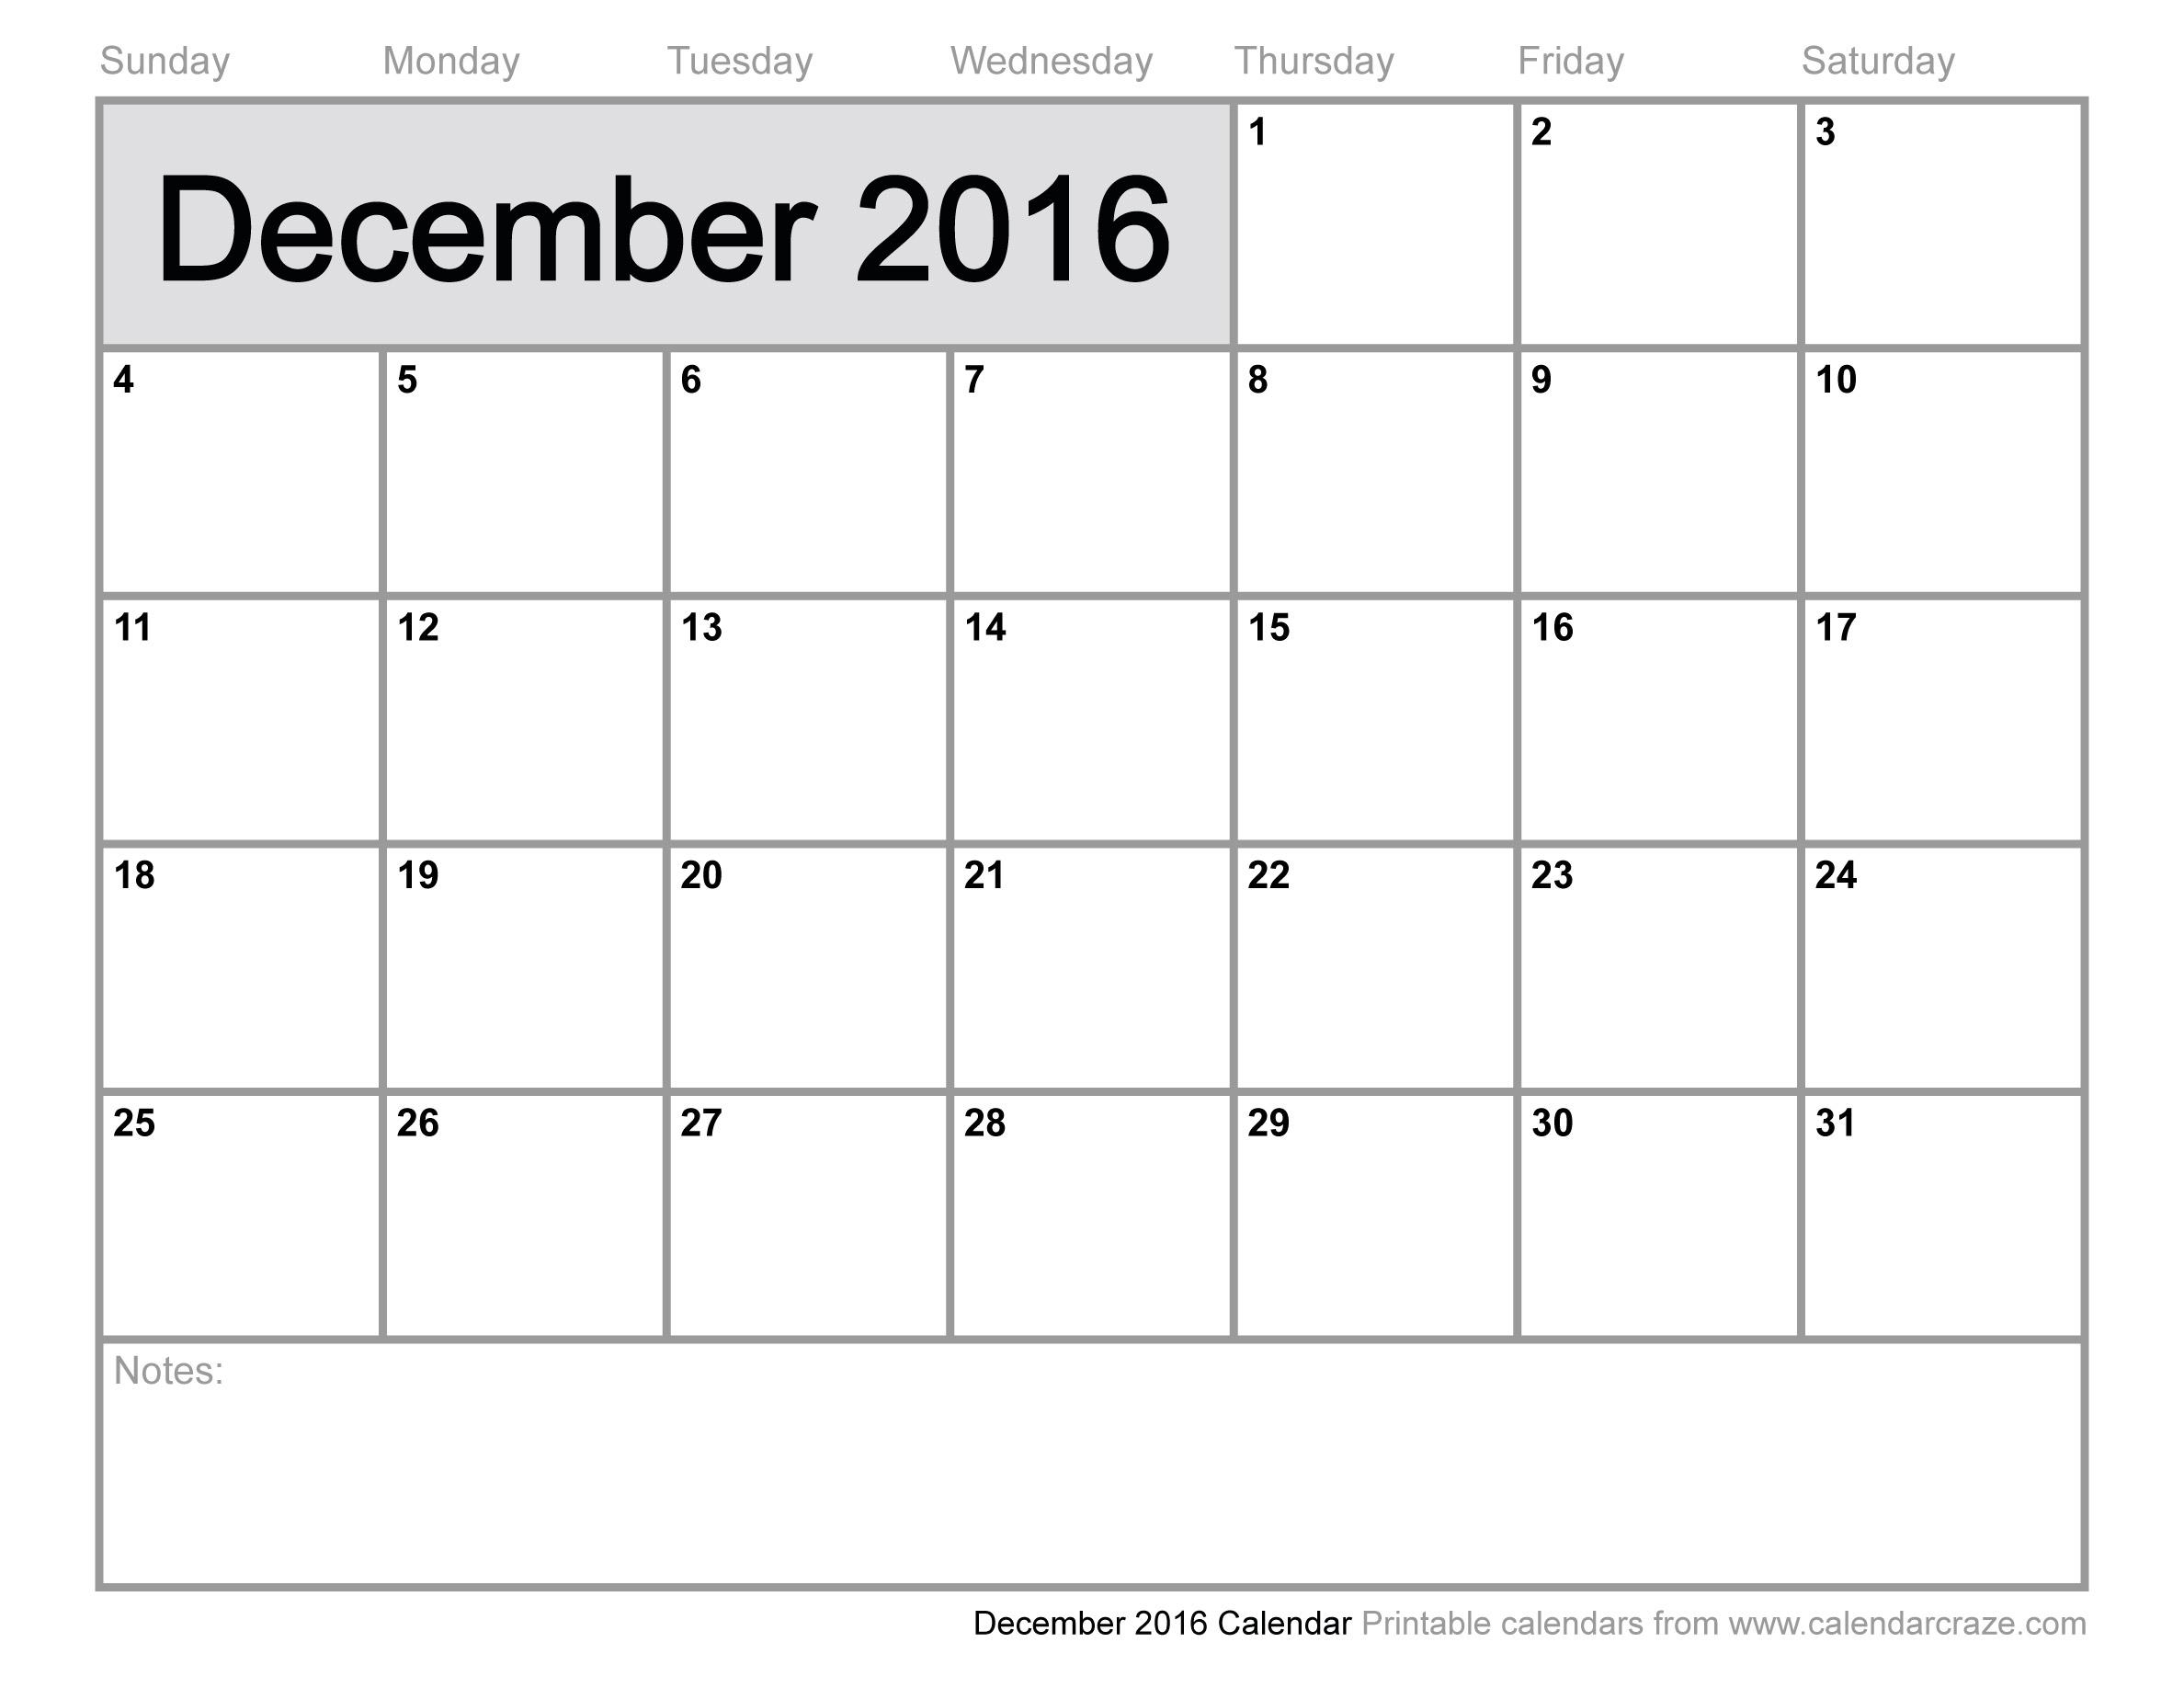 6 Images of December 2016 Calendar Printable